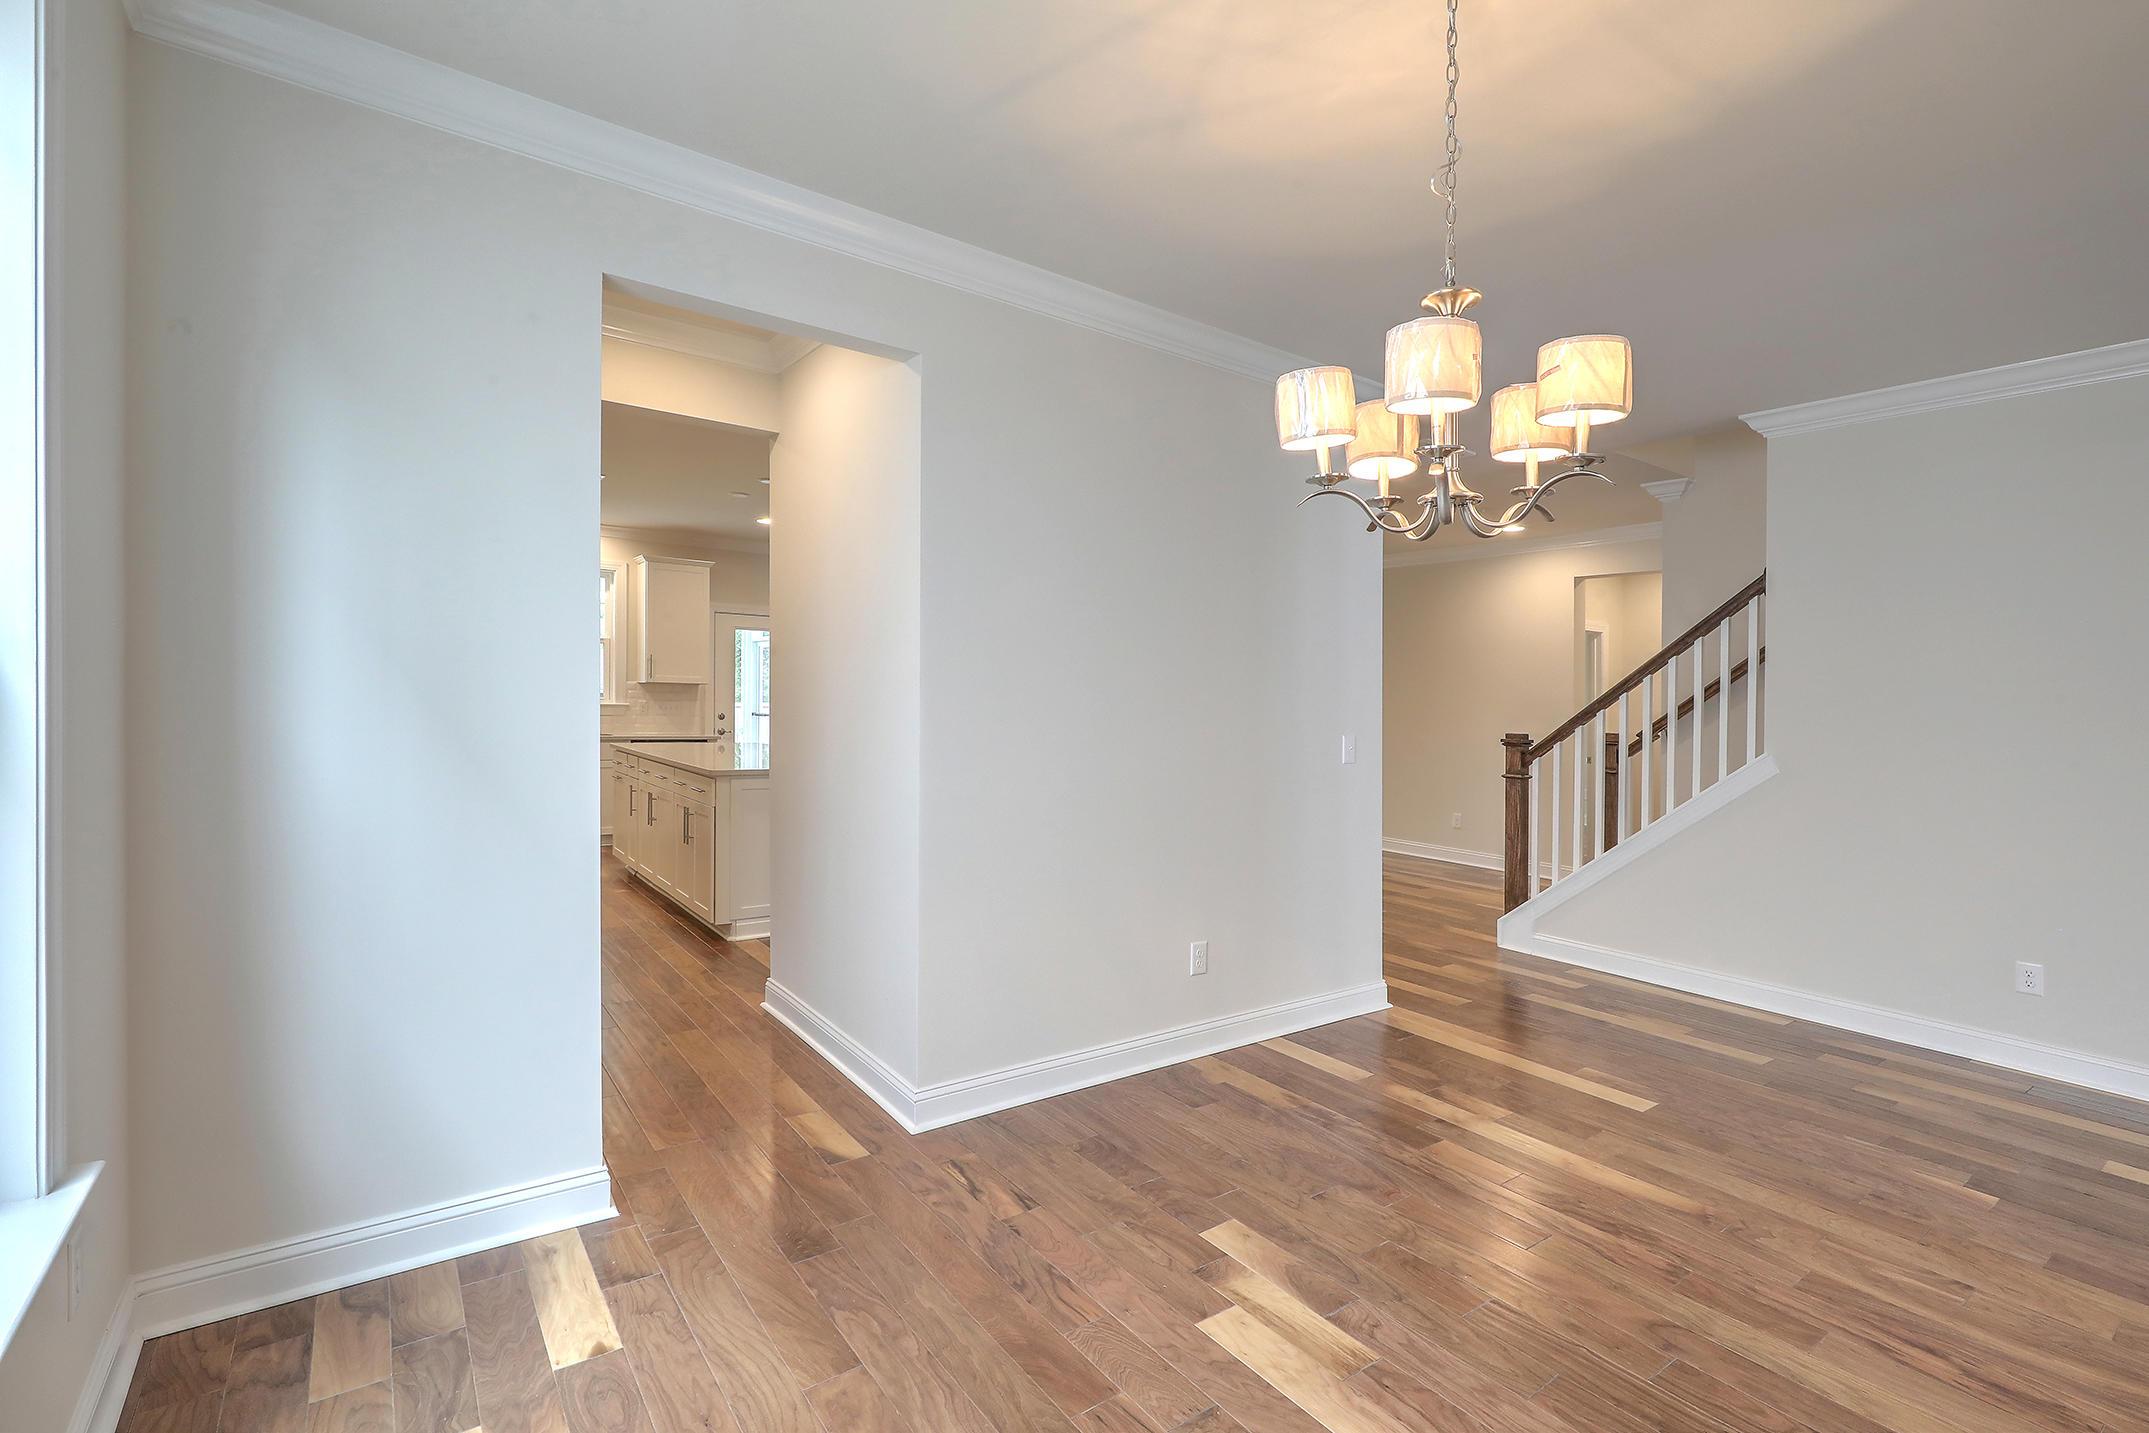 Bentley Park Homes For Sale - 1277 Gannett, Mount Pleasant, SC - 25